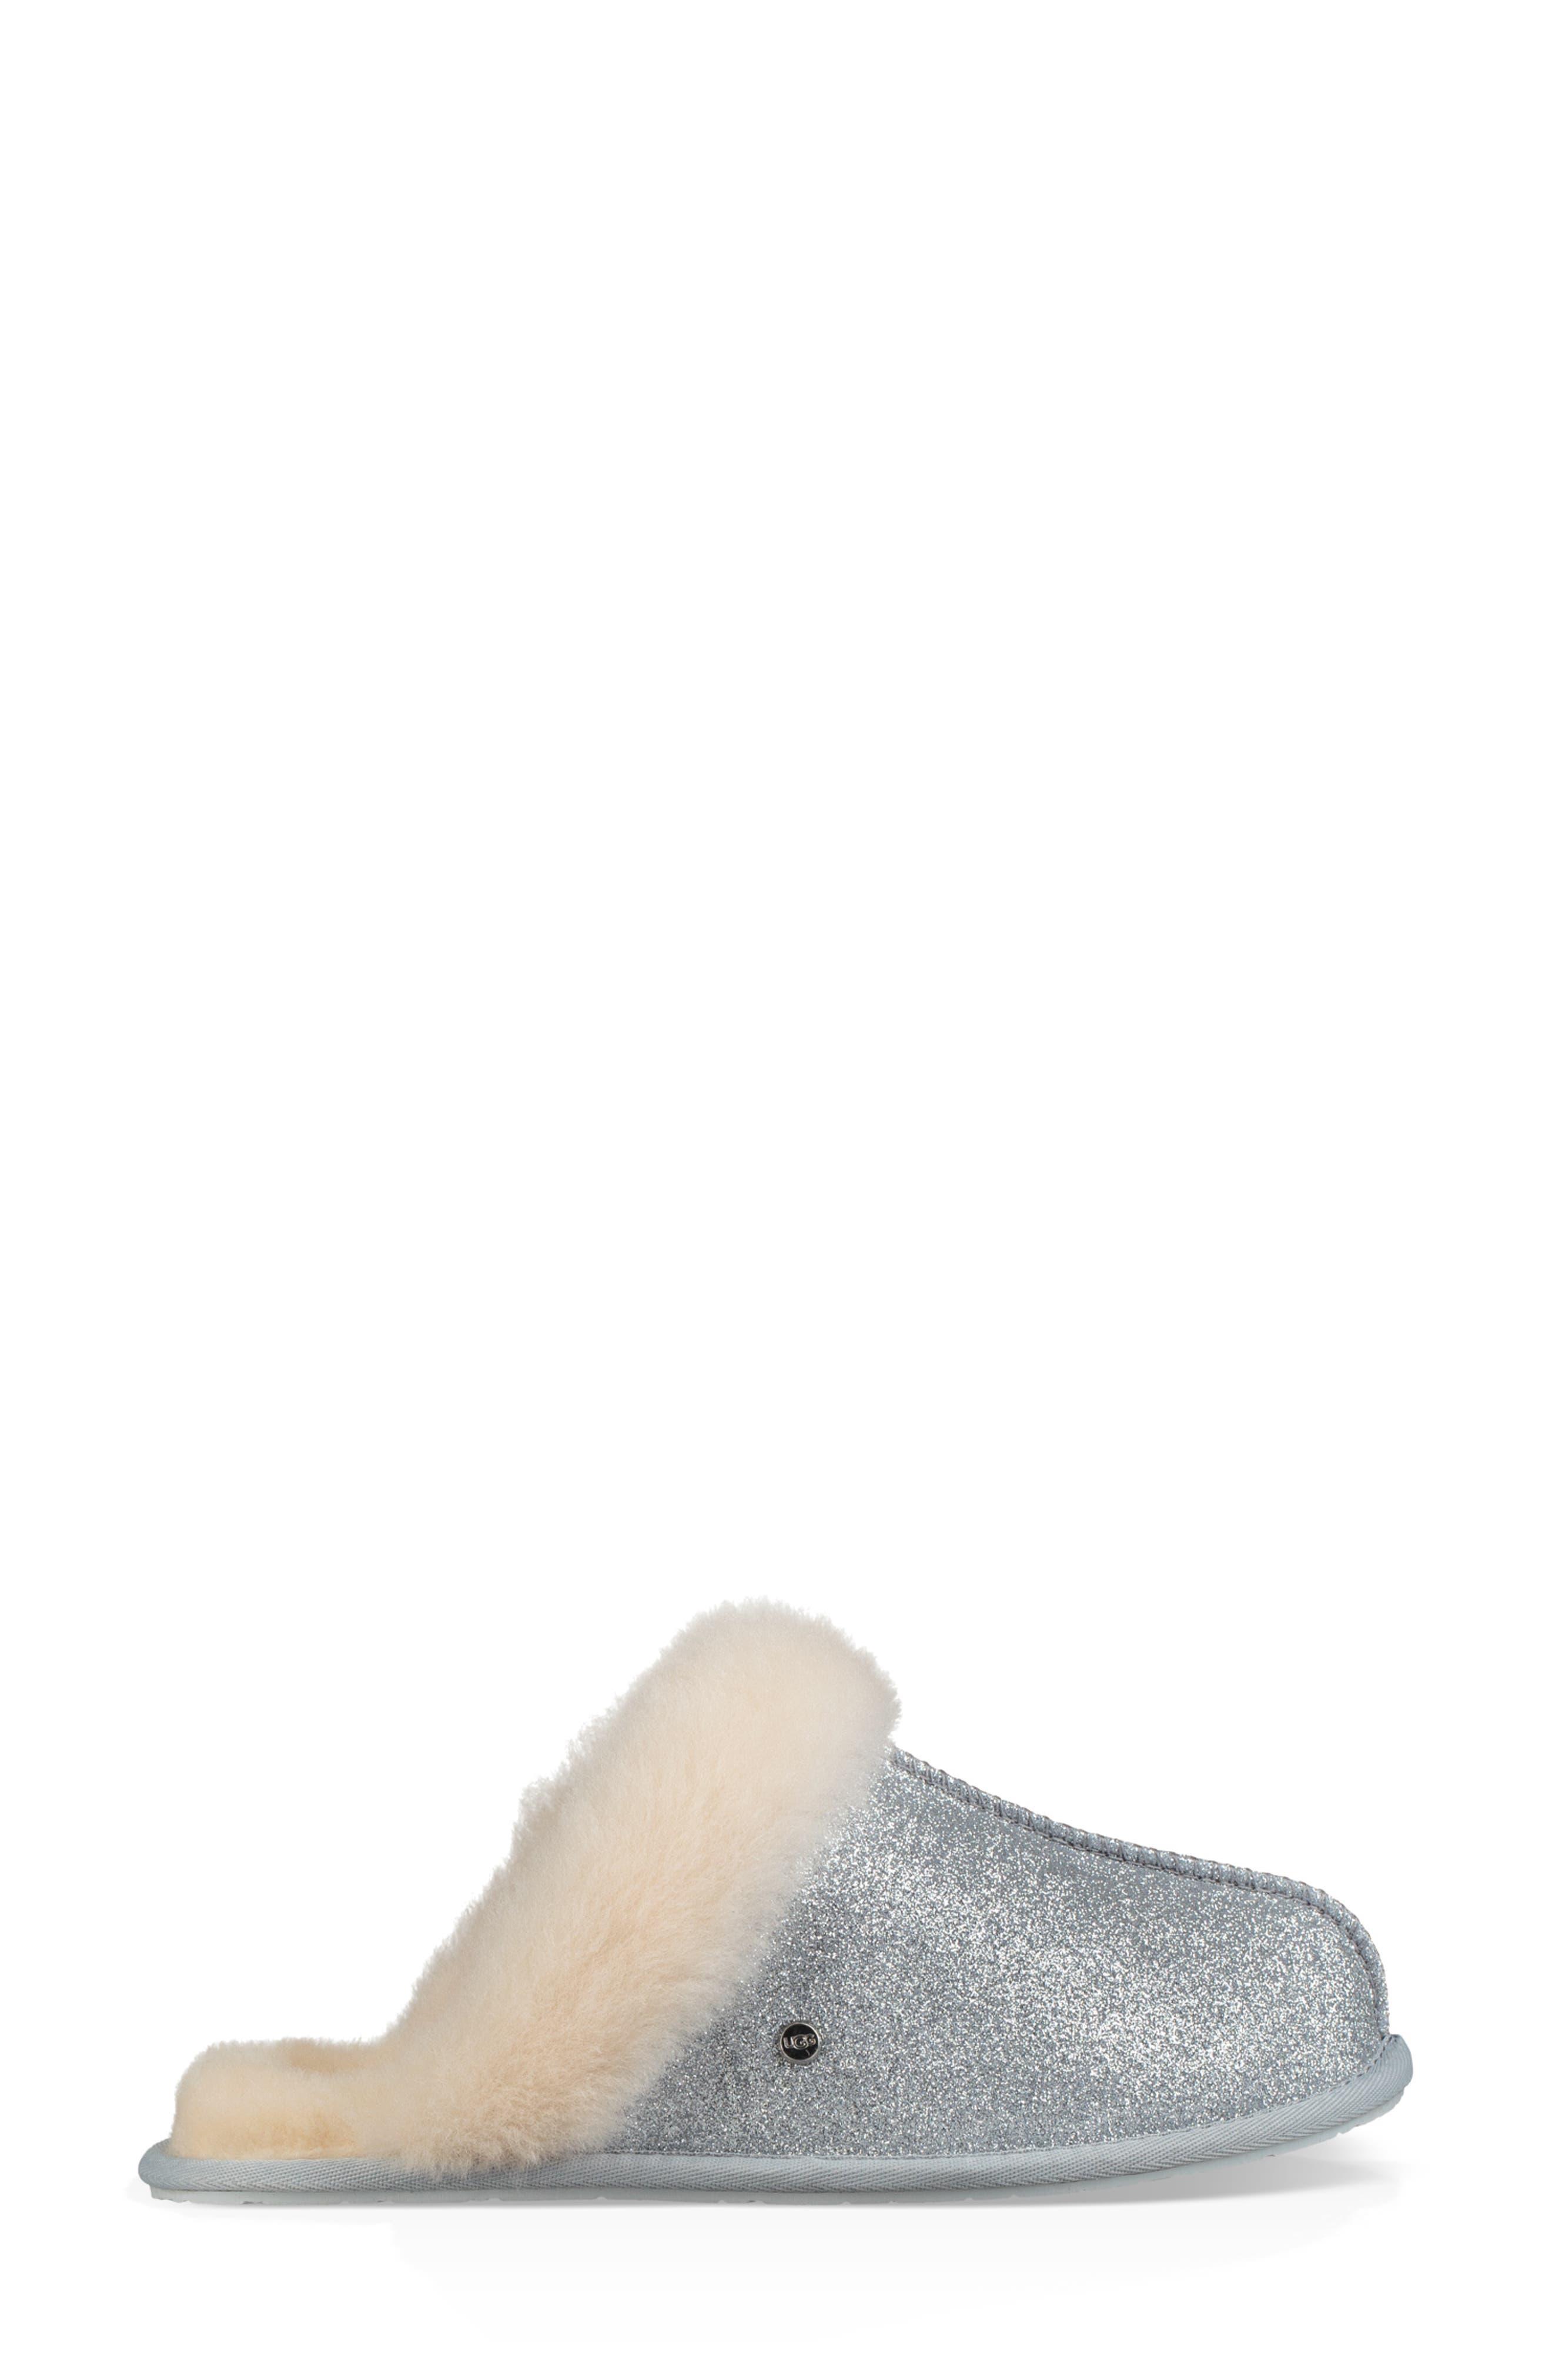 UGG<SUP>®</SUP>, Scuffette II Sparkle Genuine Shearling Slipper, Alternate thumbnail 3, color, SILVER